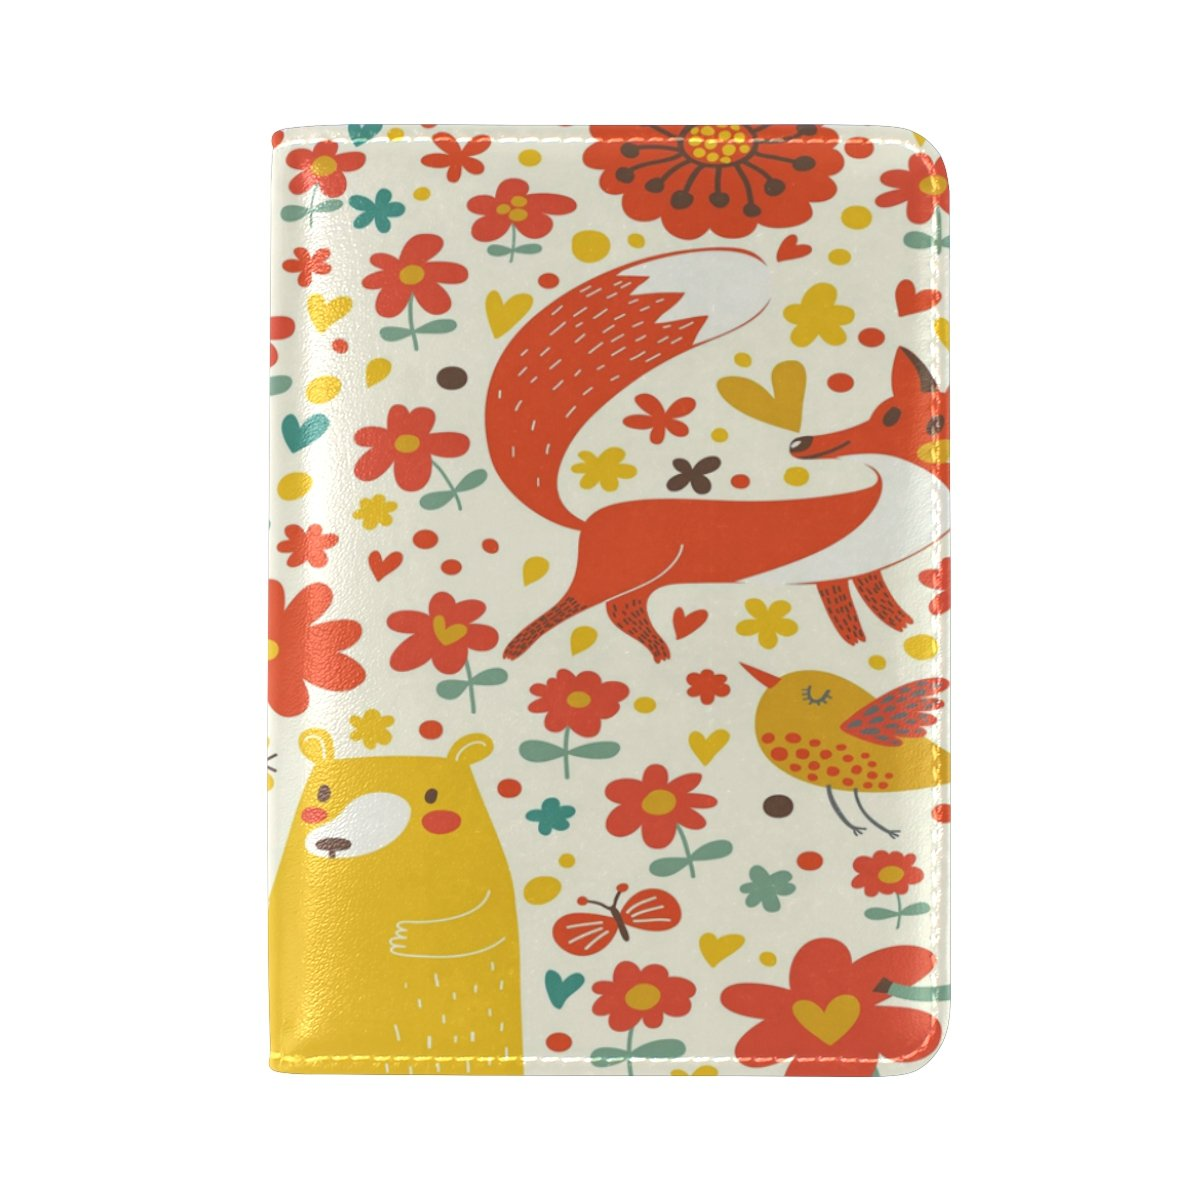 ALAZA Autumn Bear Fox Bird Deer PU Leather Passport Holder Cover Case Travel One Pocket